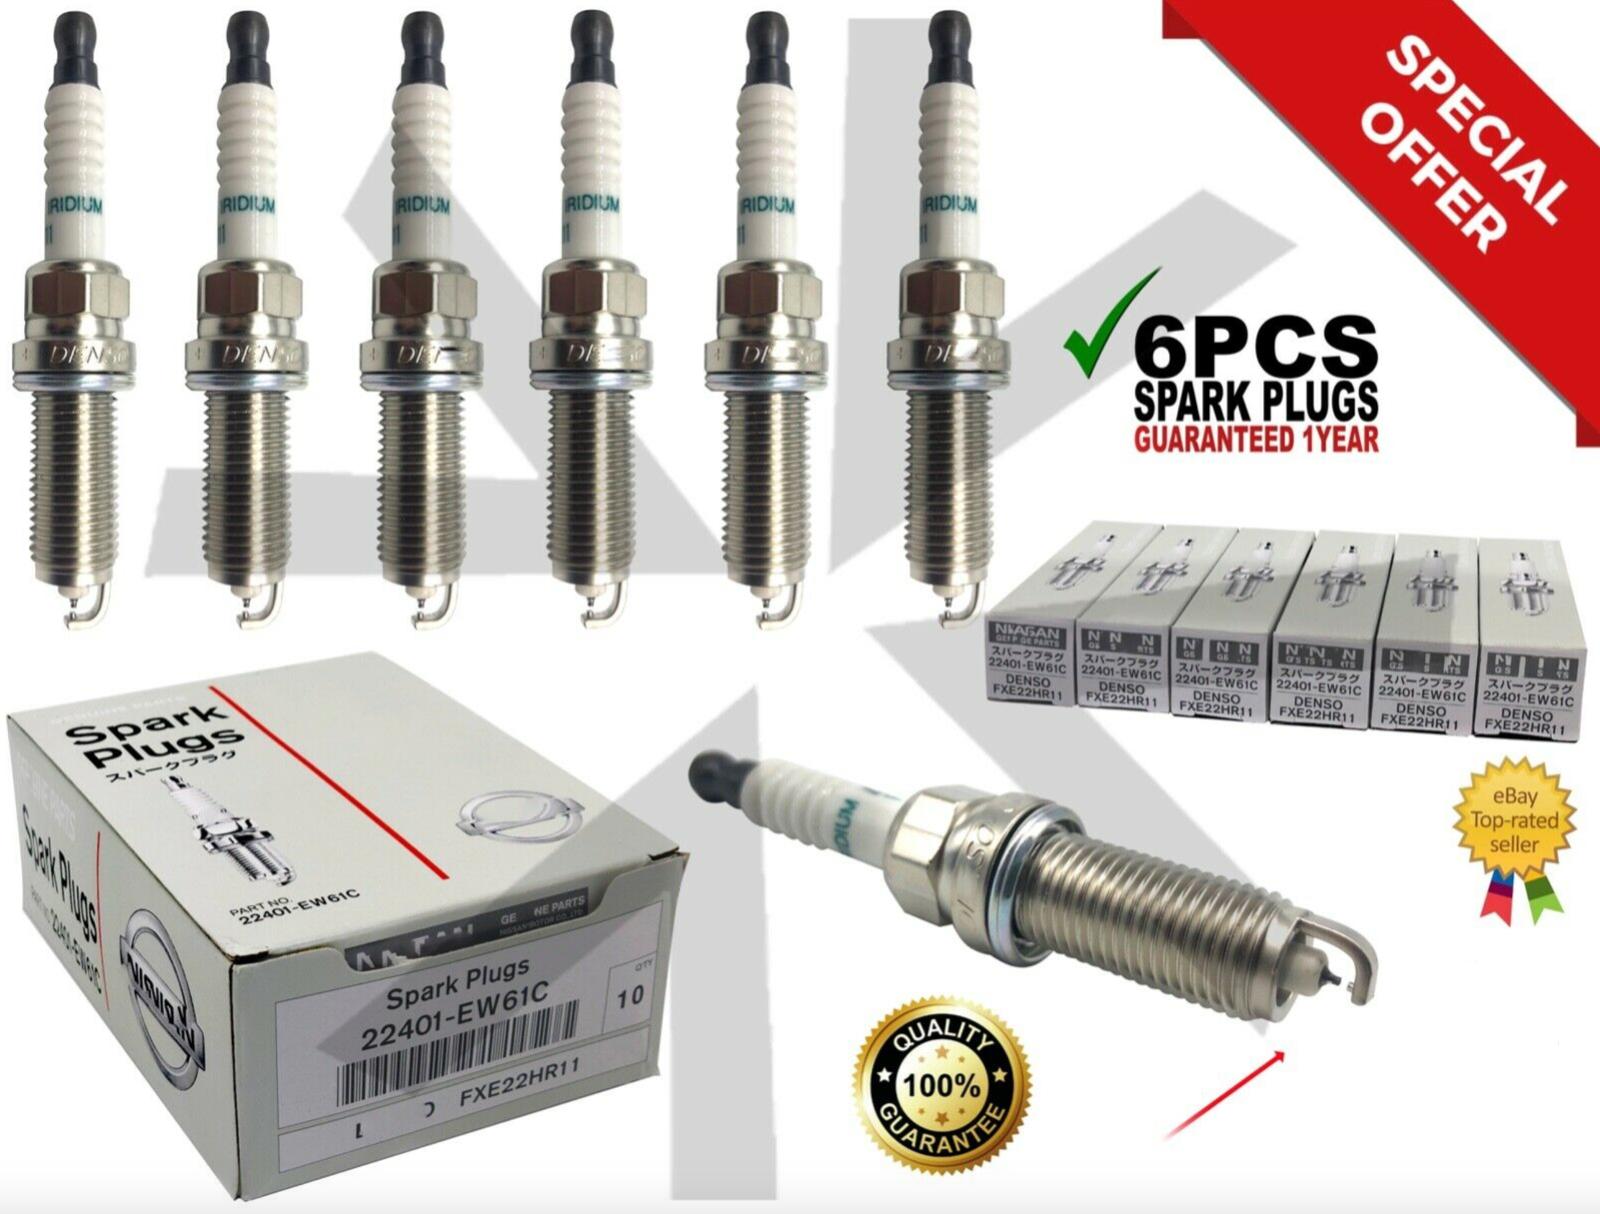 new 6 pcs Iridium Spark Plugs G35 FXE22HR11 22401-EW61C fit for Nissan Altima